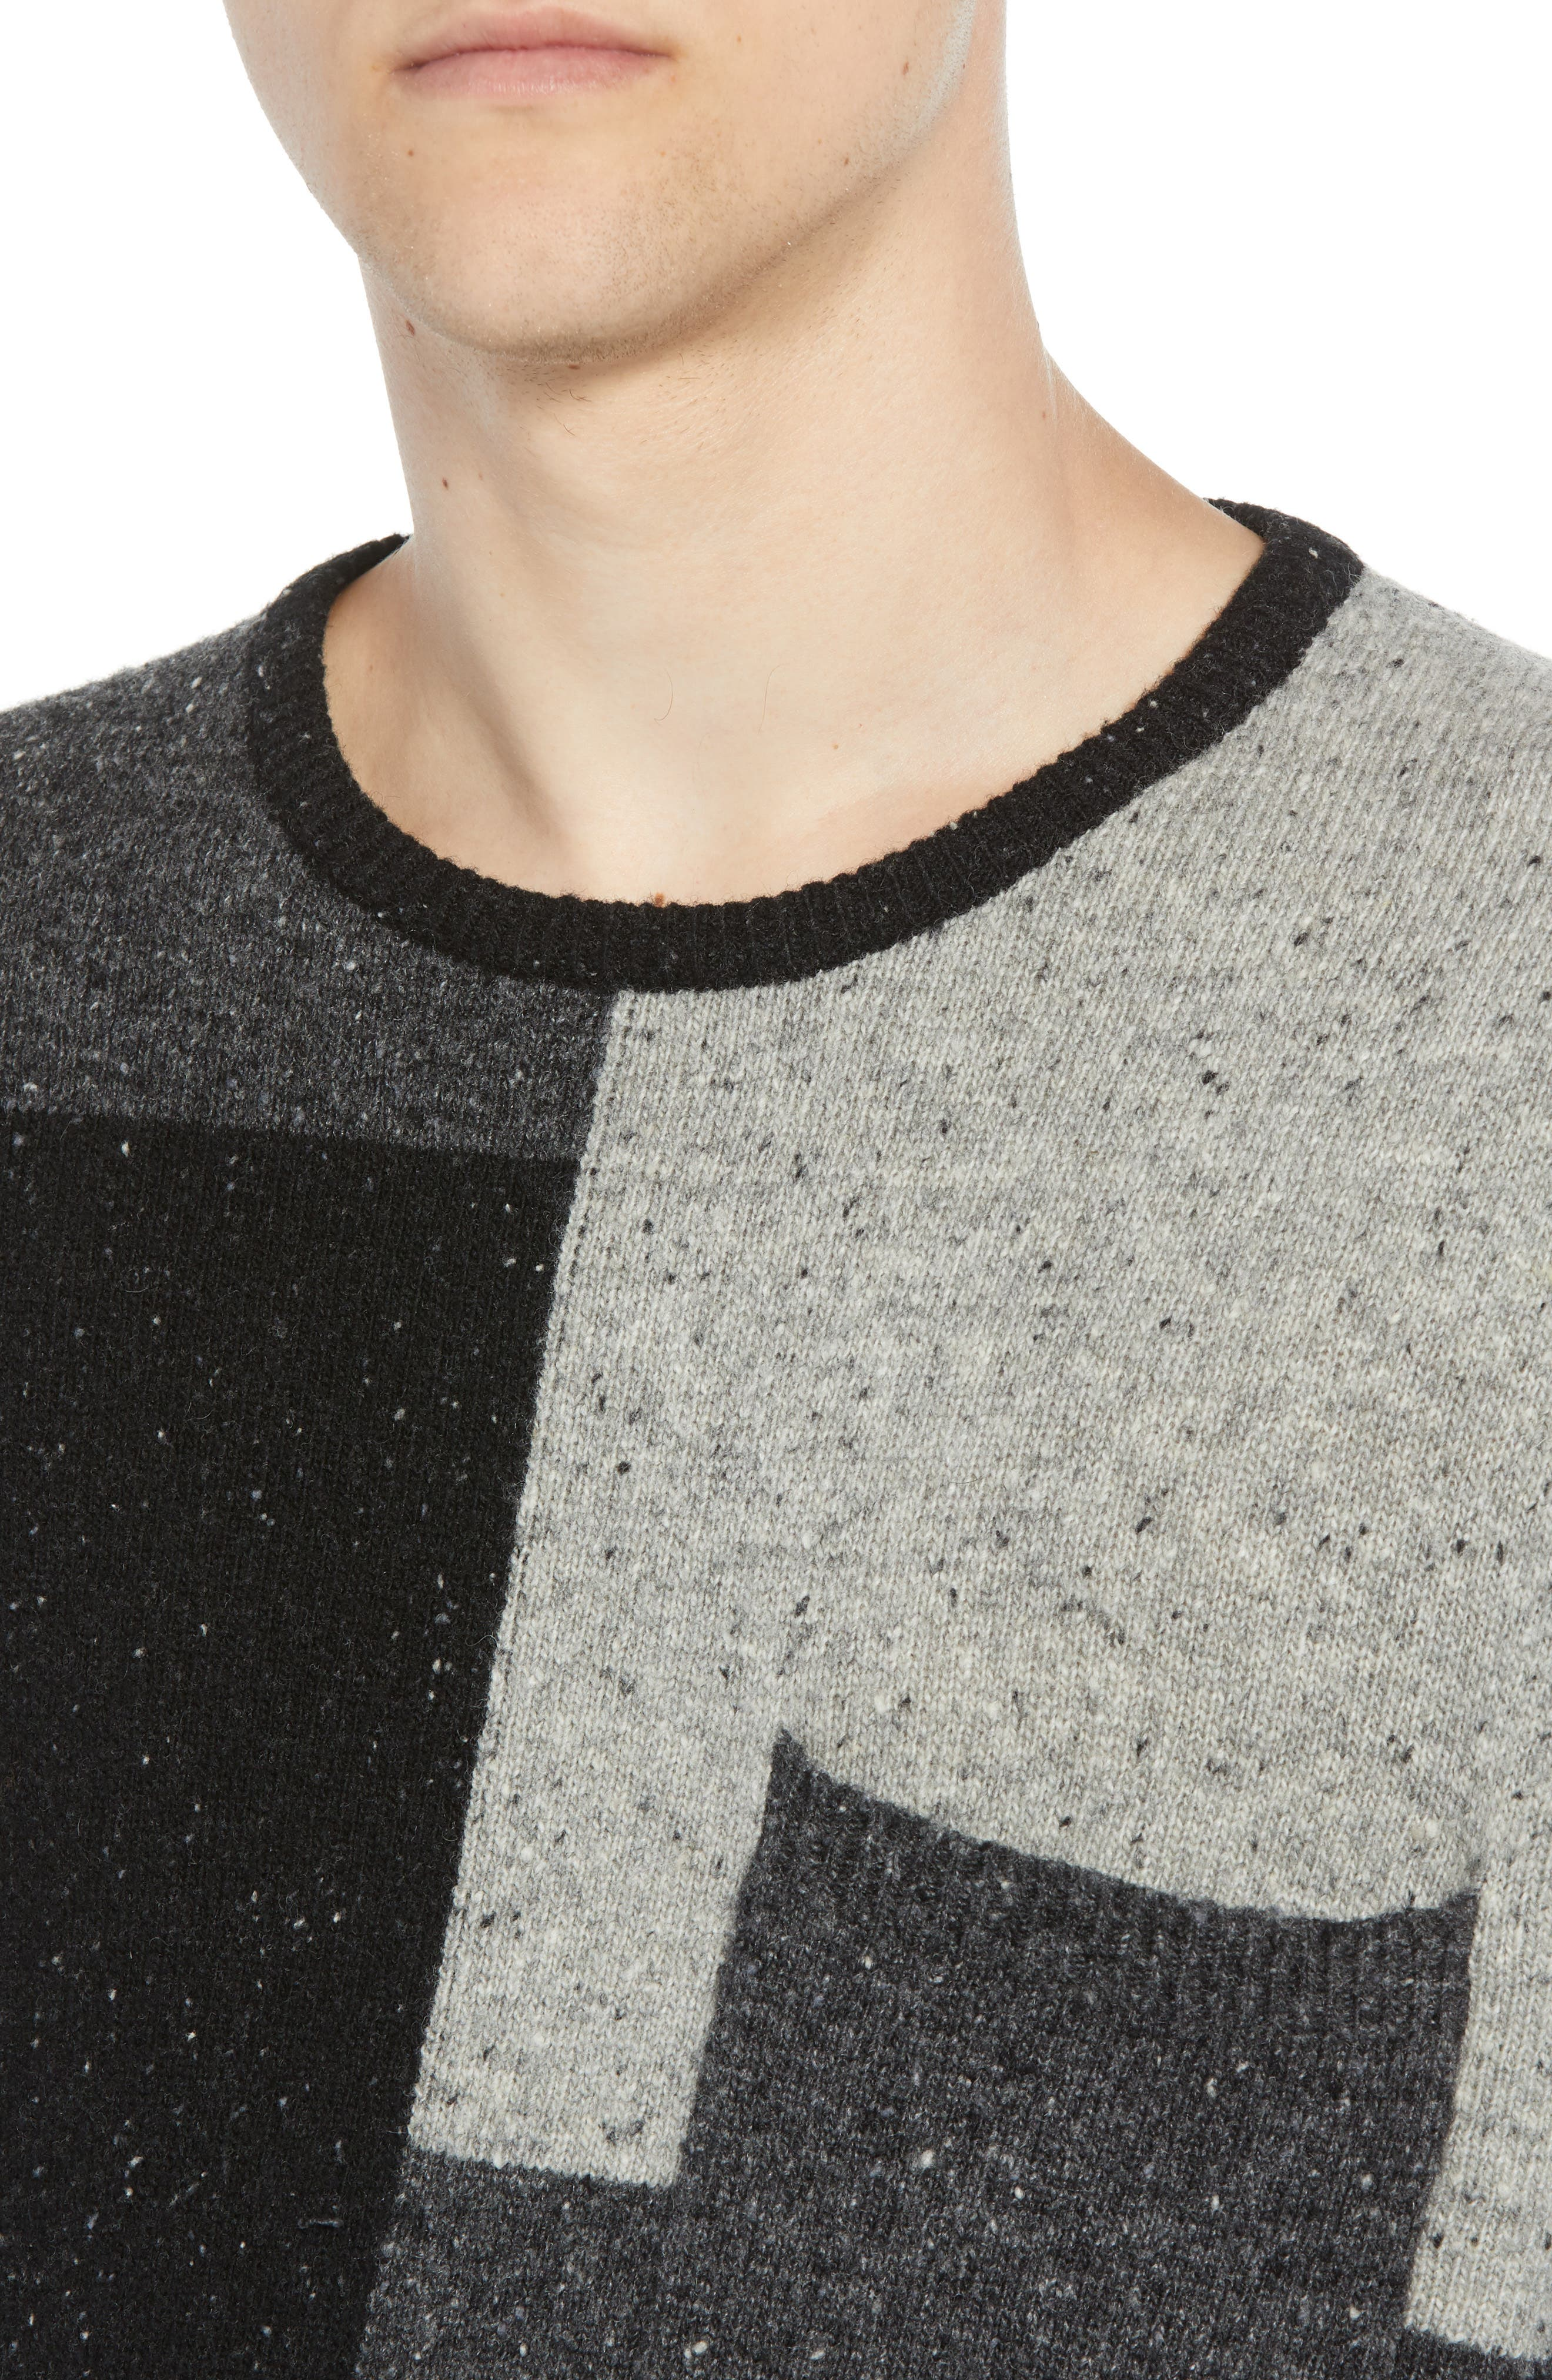 Patchwork Donegal Wool Blend Sweater,                             Alternate thumbnail 4, color,                             LIGHT GREY MELANGE CHARCOAL